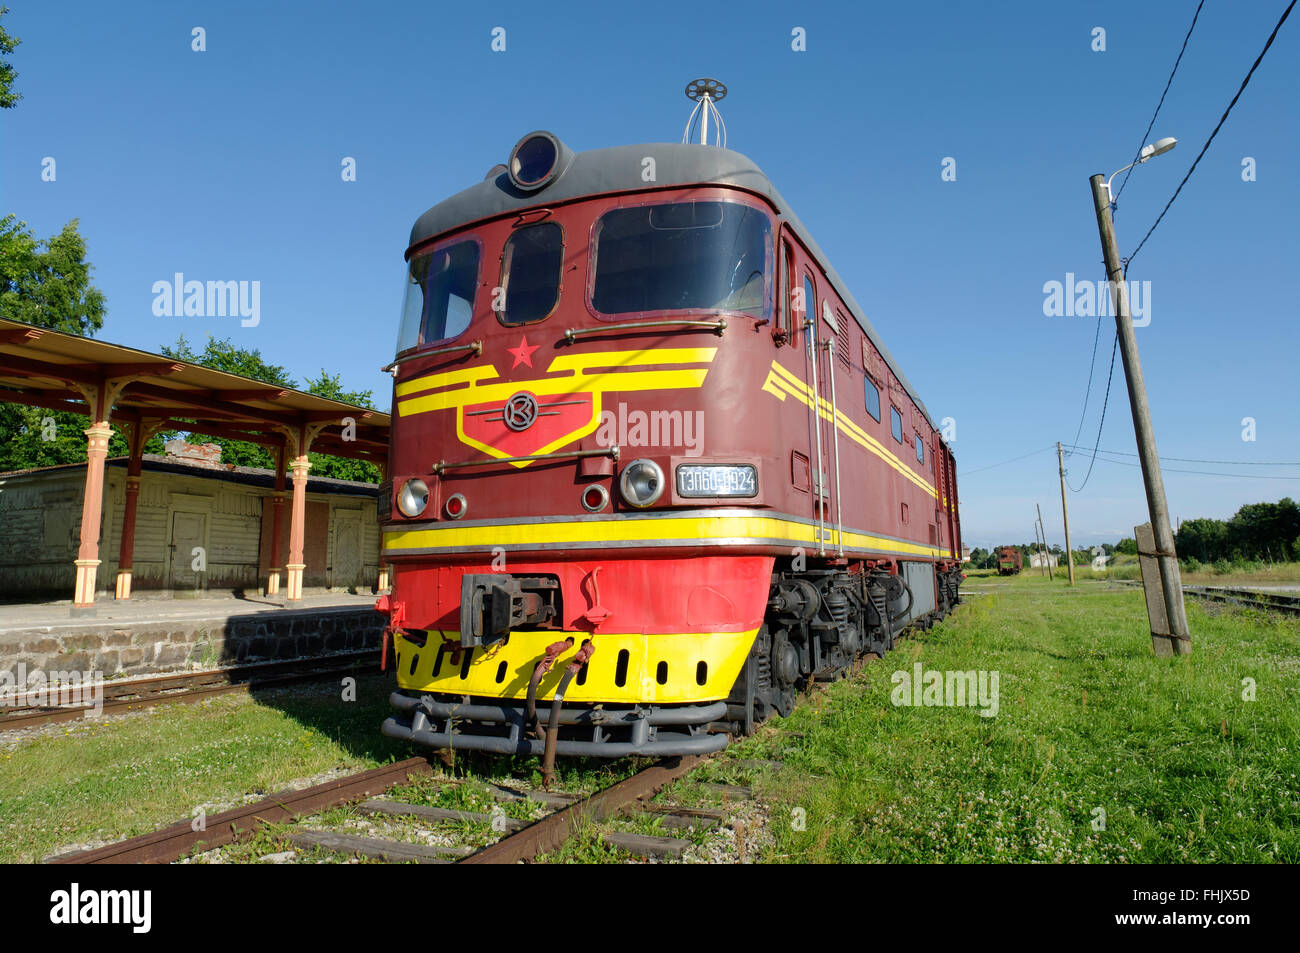 The Railway and Communications Museum exhibit in Haapsalu, the old diesel locomotive Tep 60. Haapsalu, Estonia - Stock Image